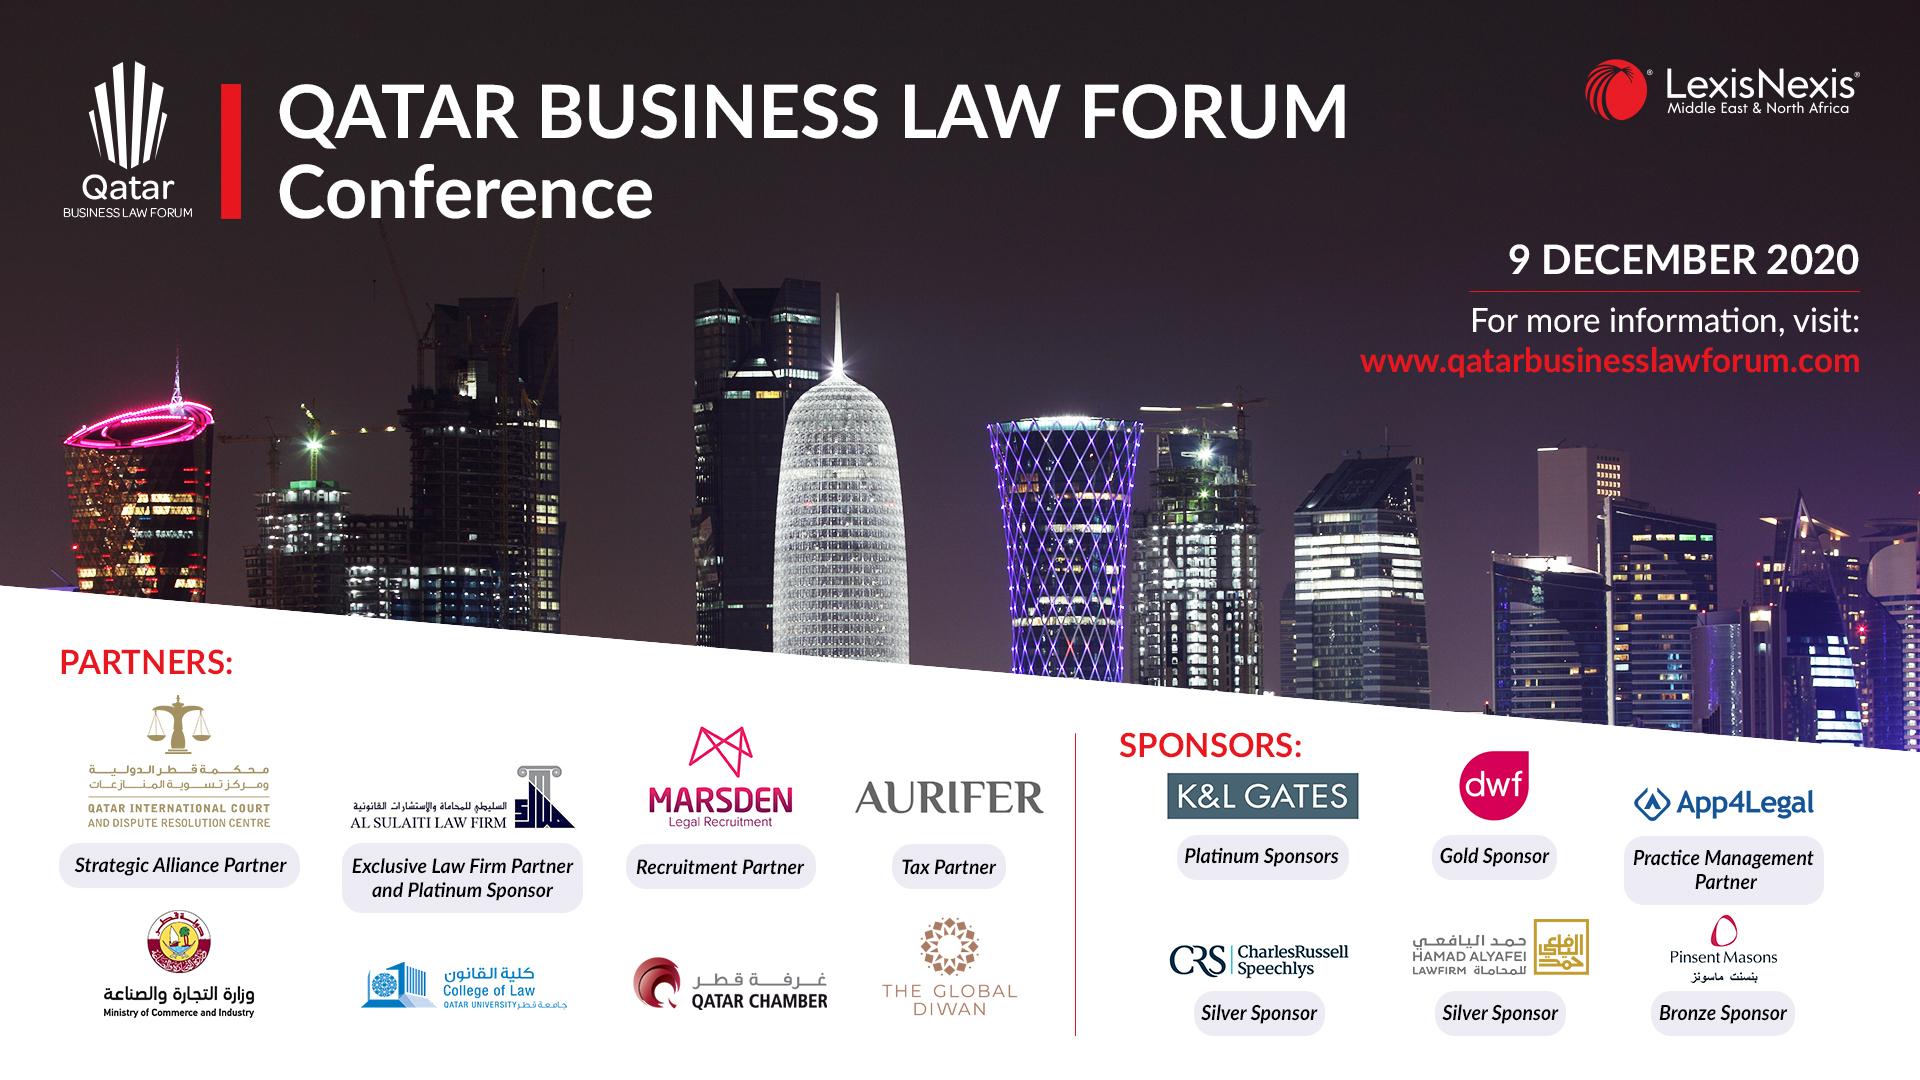 Qatar Business Law Forum Awards Ceremony 2020 | 9 December 2020 (Online Event)